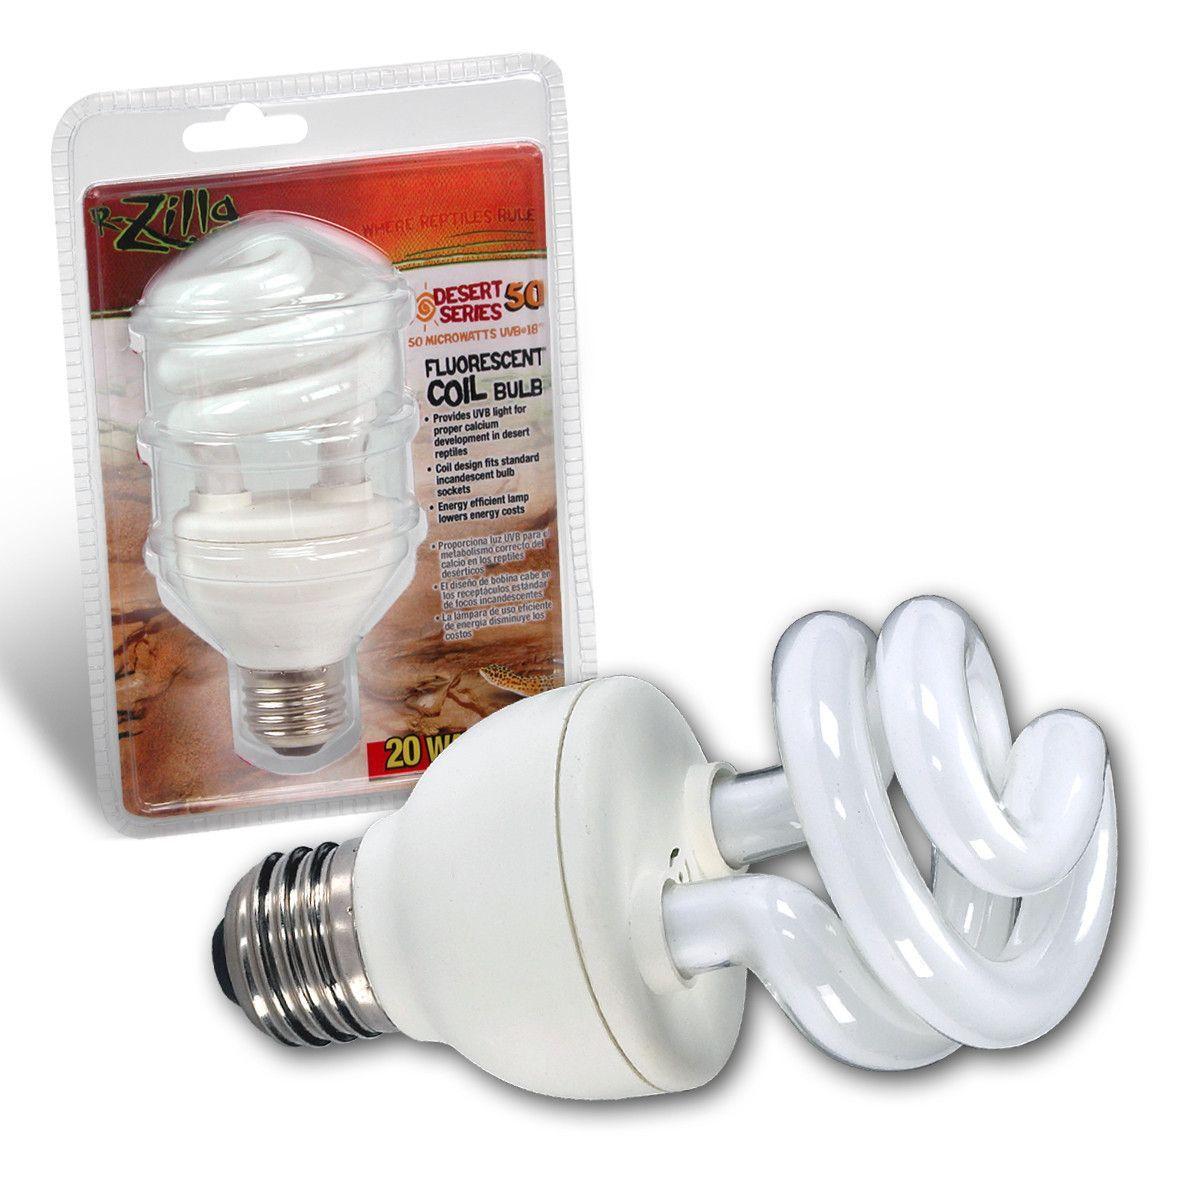 Zilla Desert 50 Uvb Fluorescent Coil Bulb 20w Bulb Uva Light